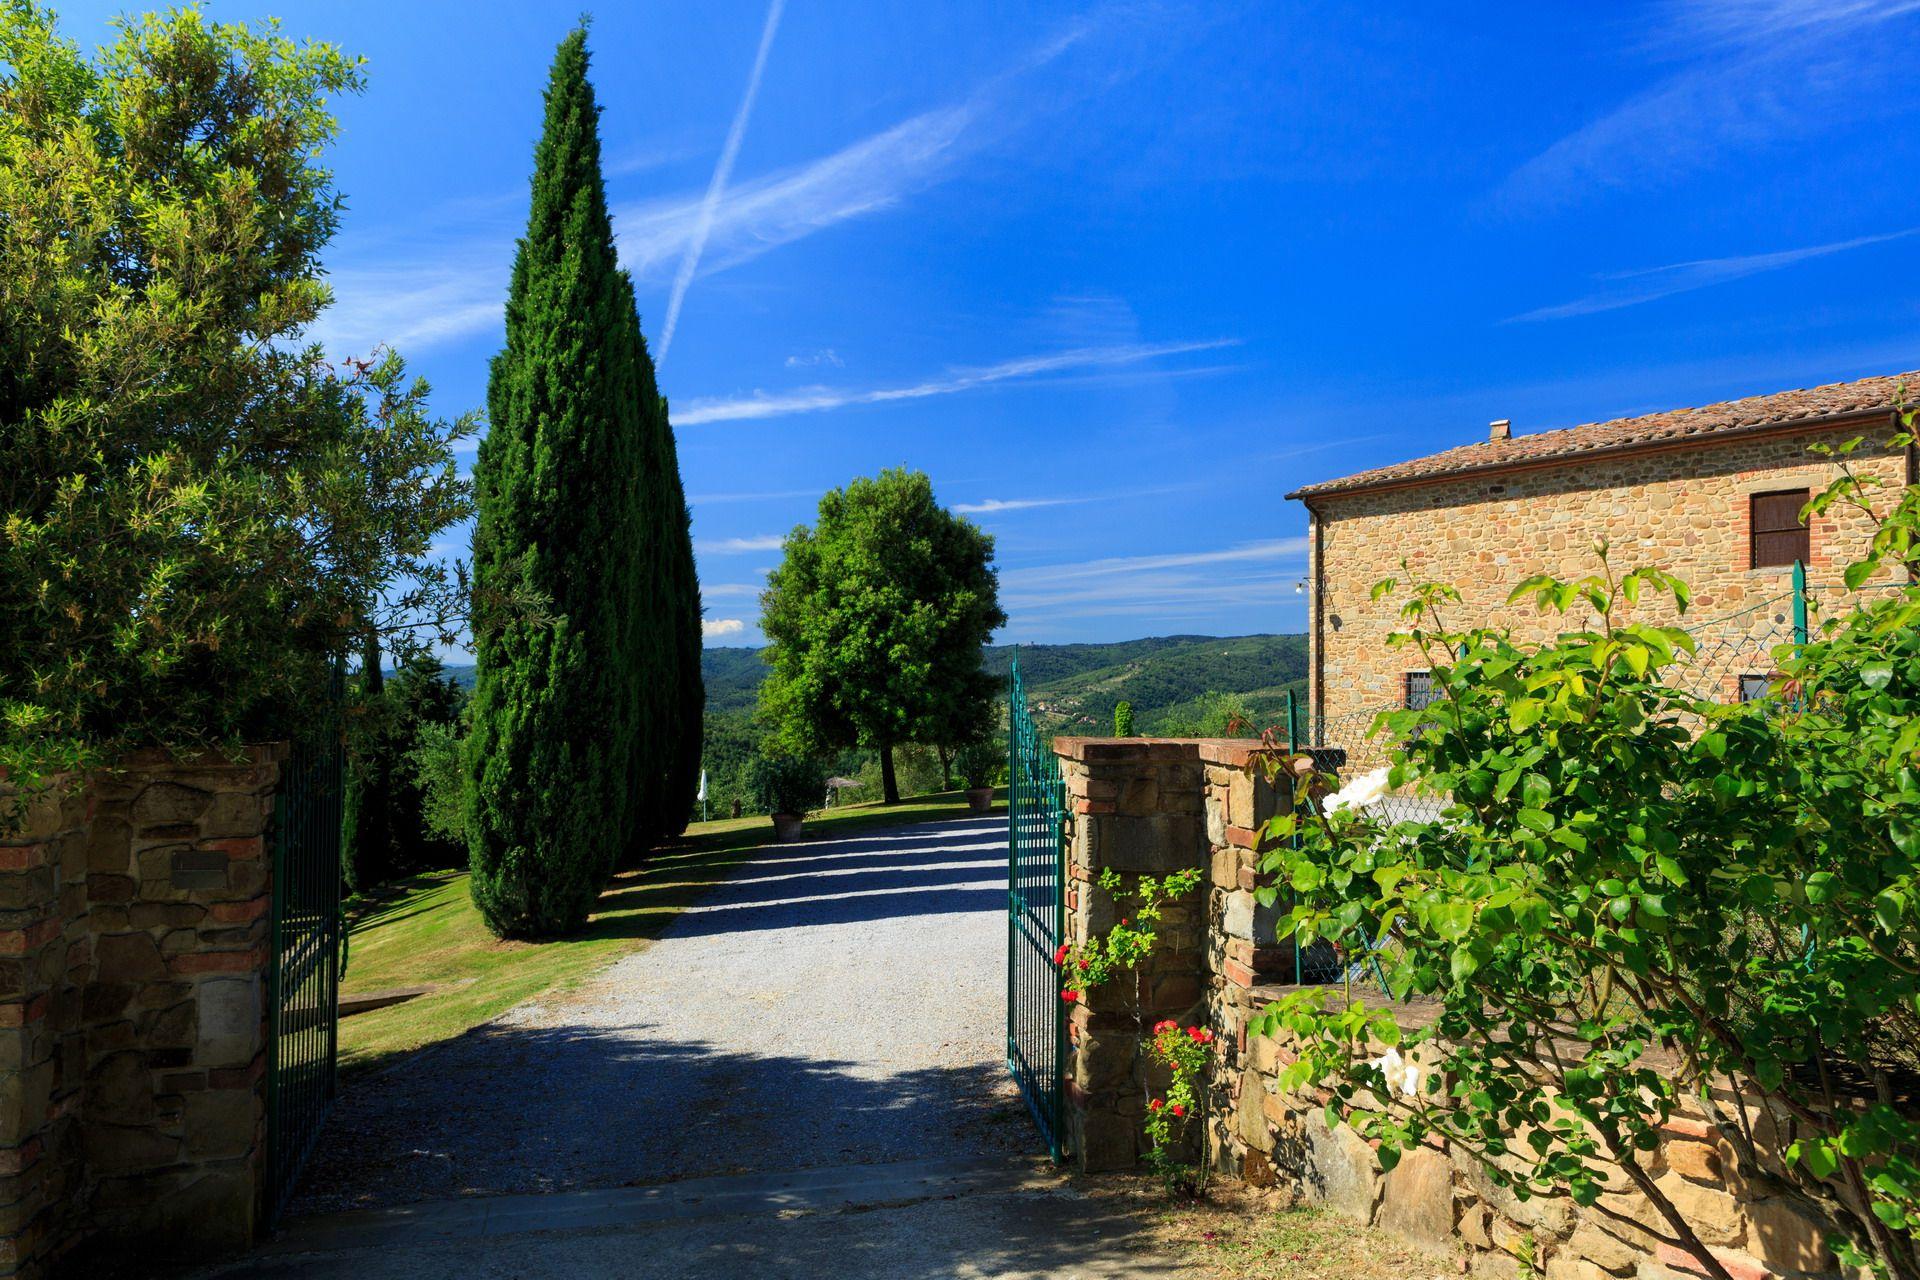 Benvenuti all' #agriturismo Camperchi! Welcome to Camperchi #agritourism!